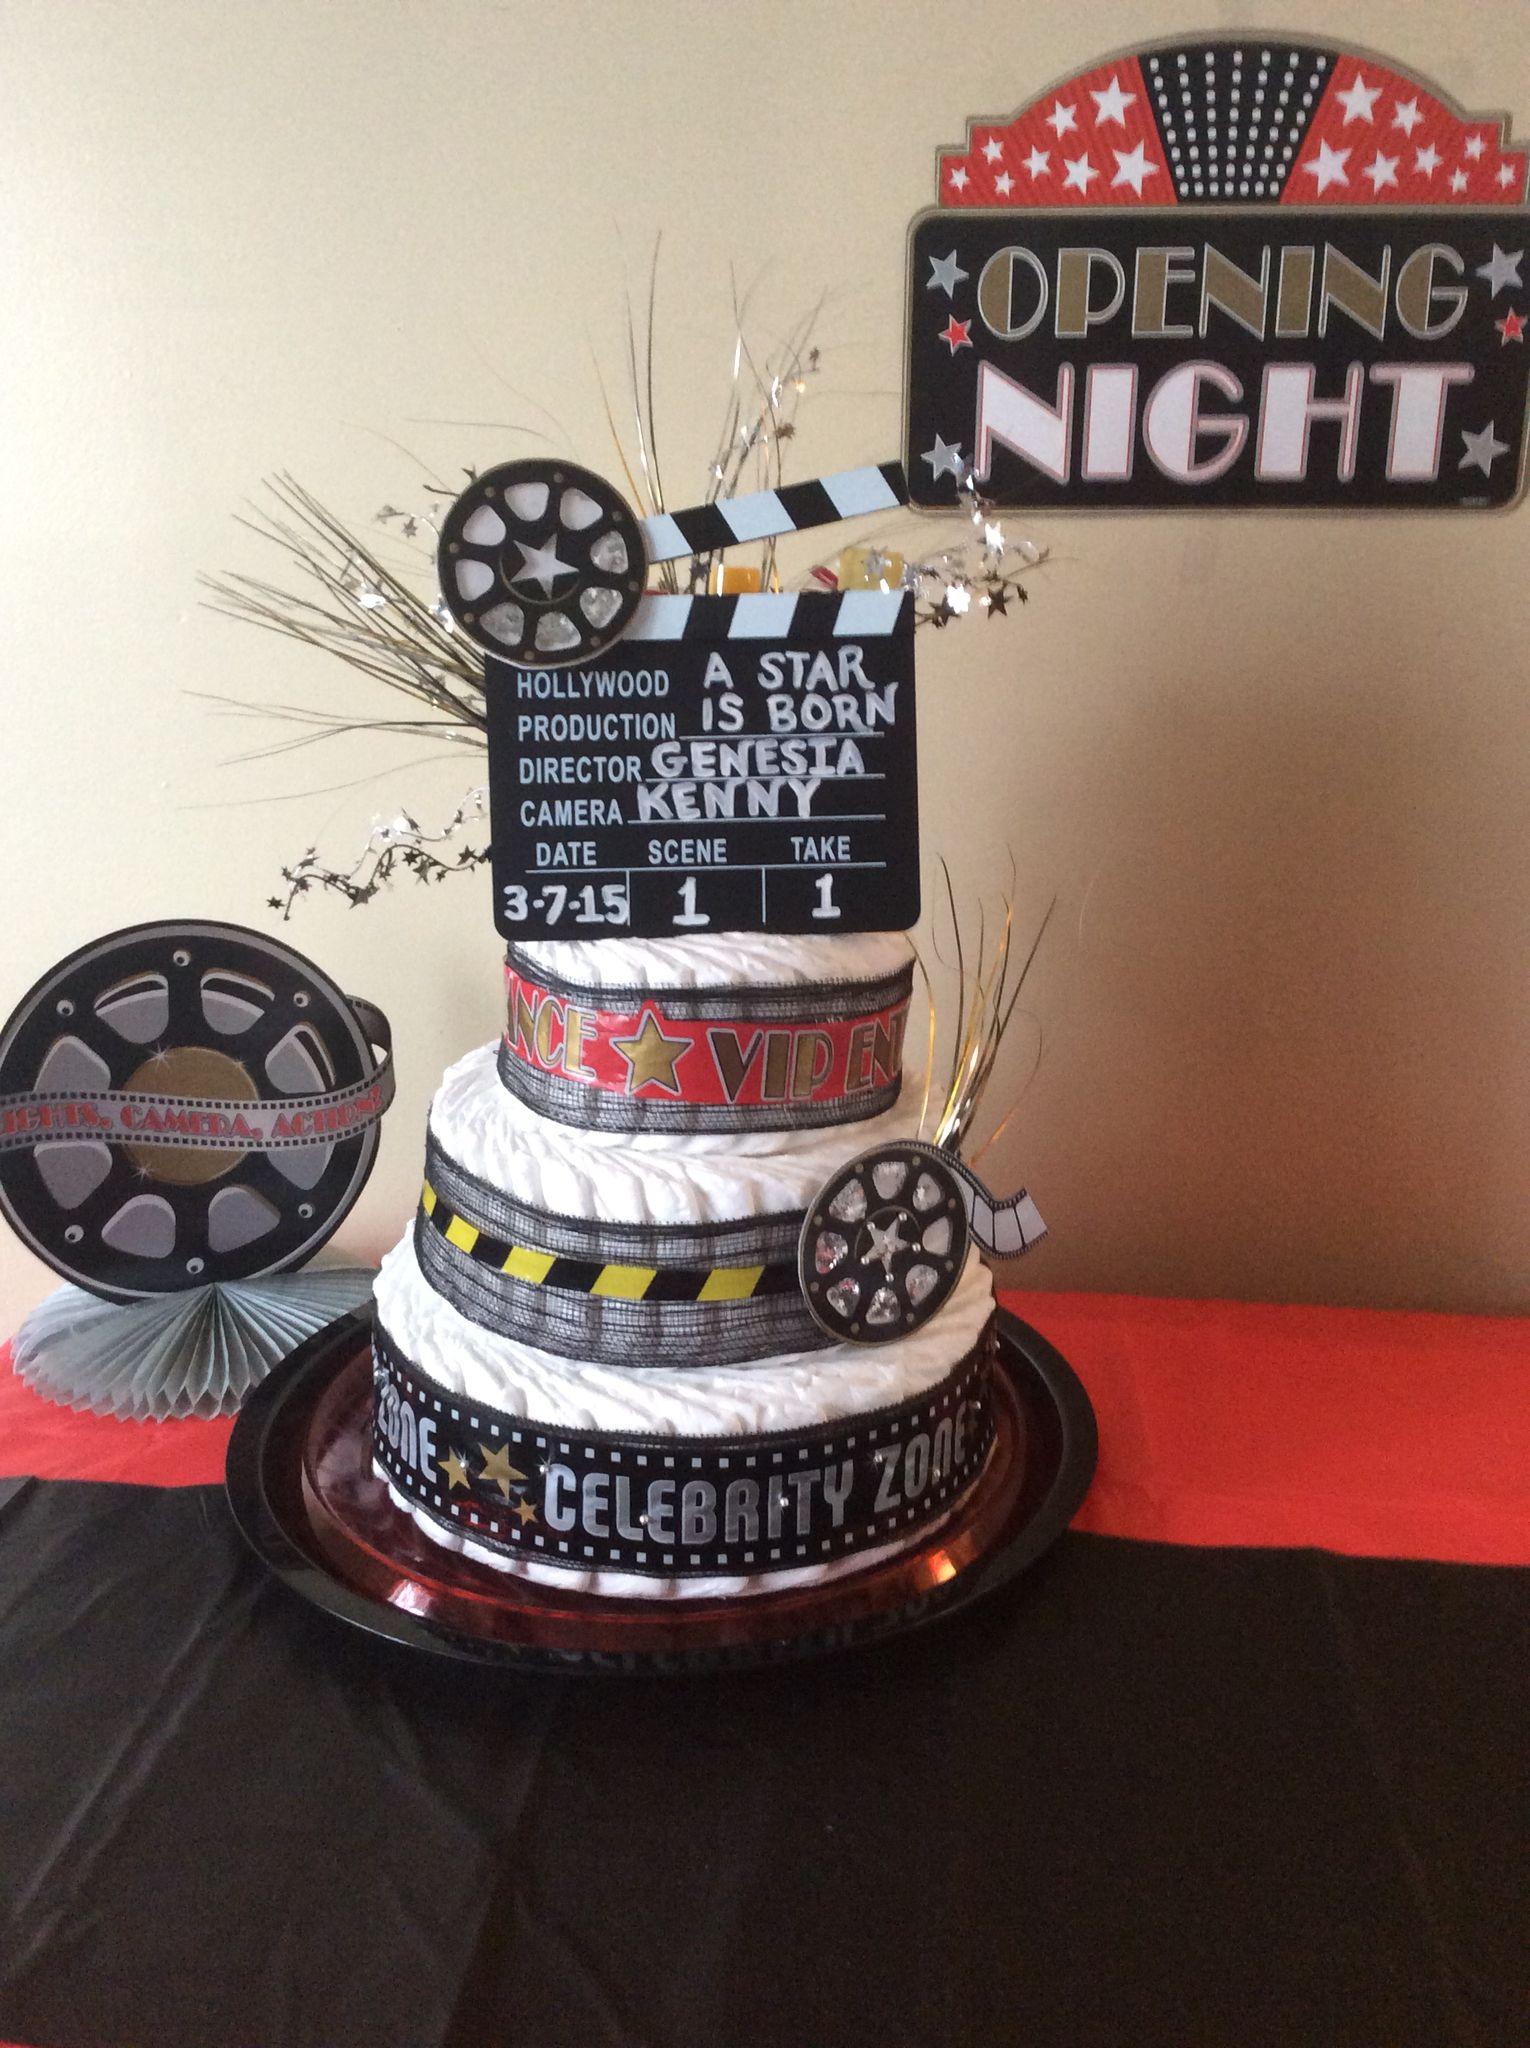 127 Diaper Custom Decorated Diaper Cake For A Movie Star